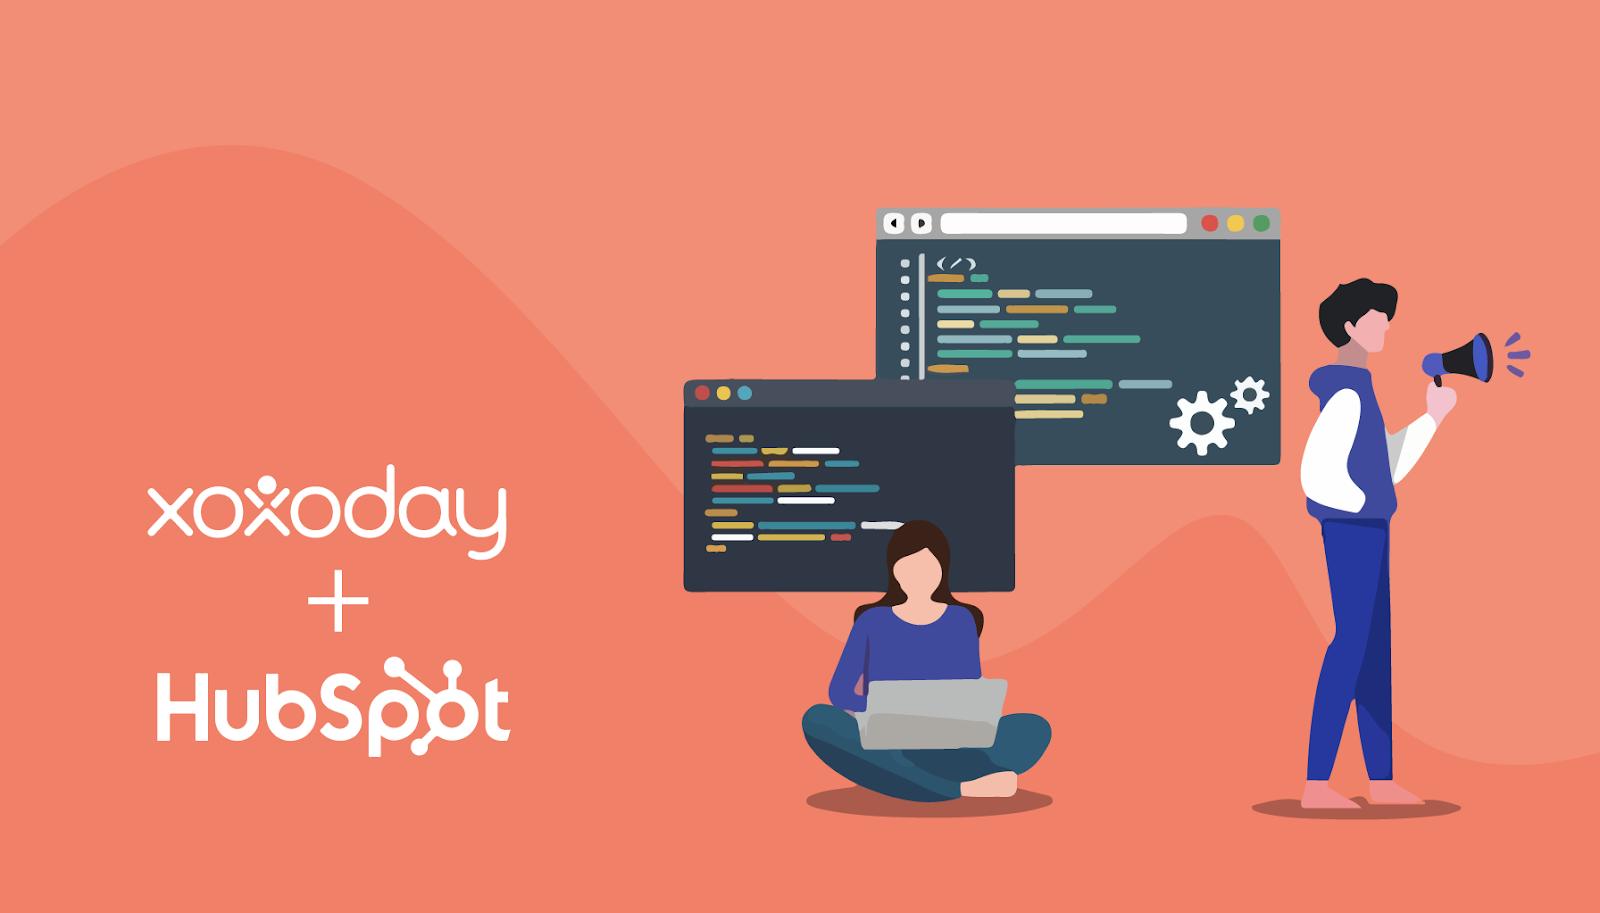 Xoxoday+HubSpot